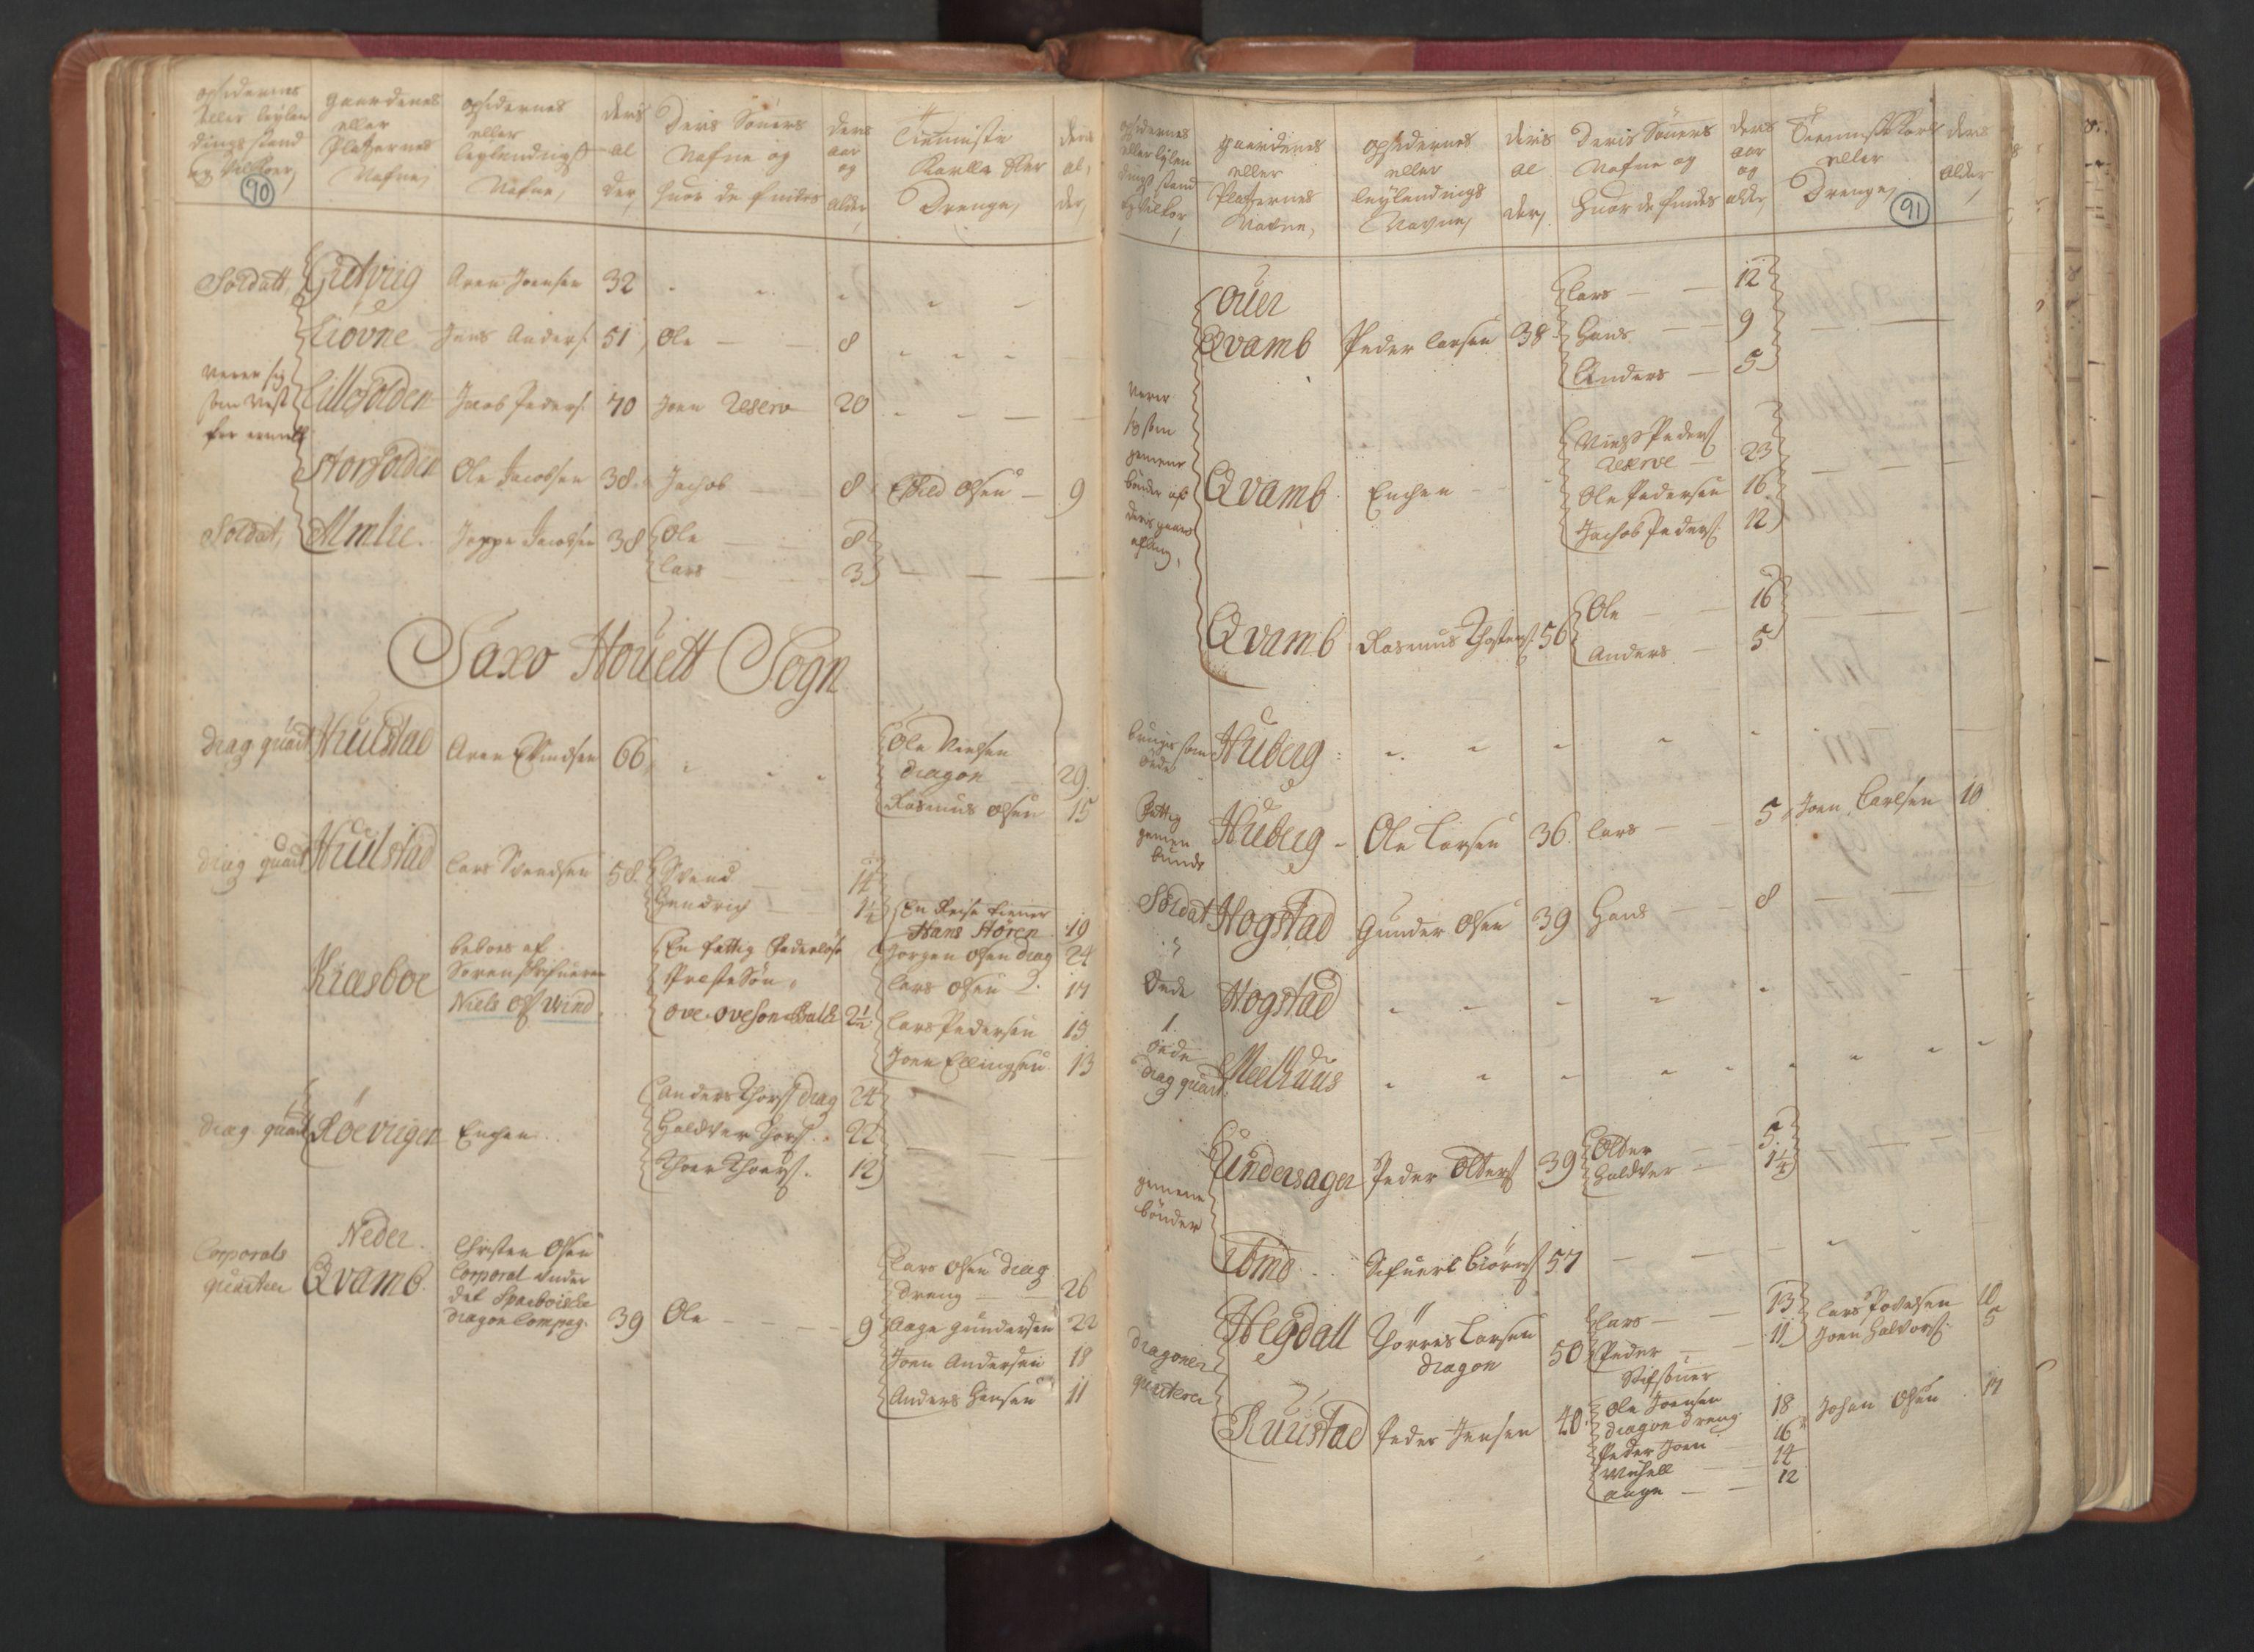 RA, Manntallet 1701, nr. 15: Inderøy fogderi og Namdal fogderi, 1701, s. 90-91